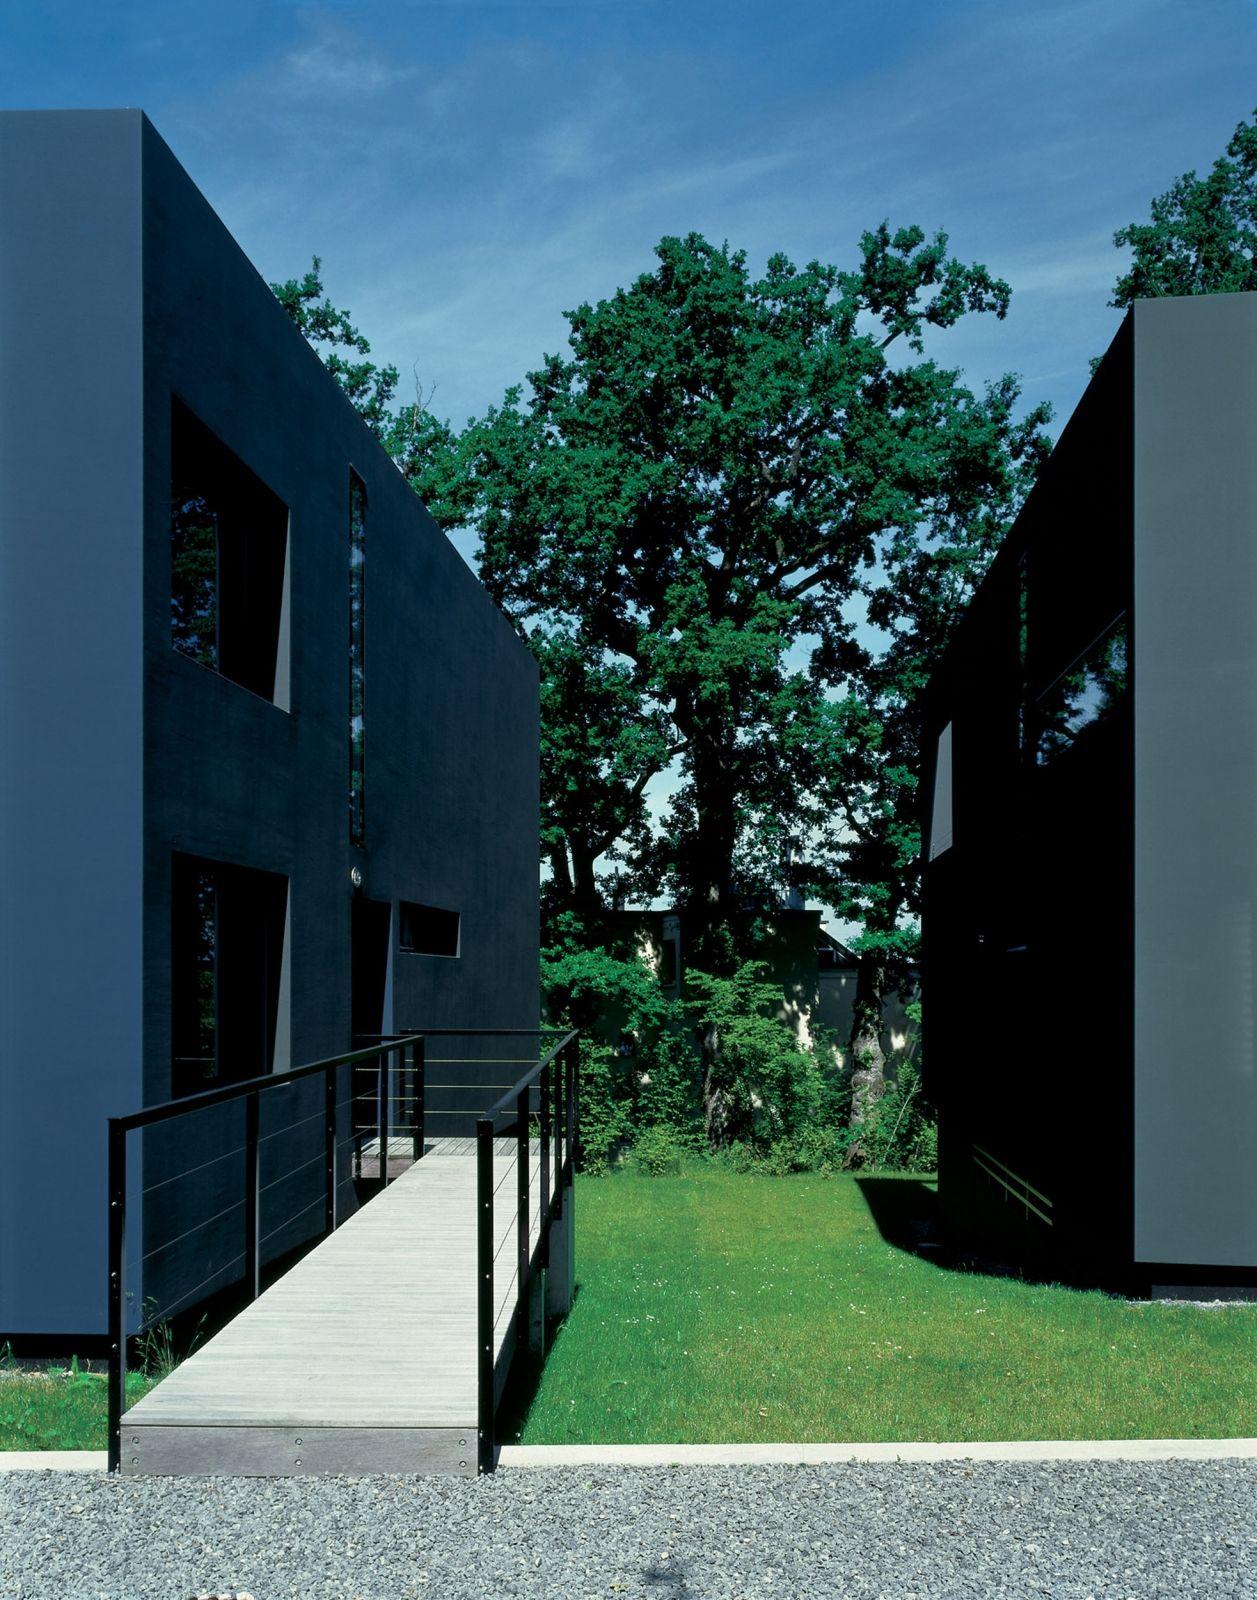 2 X 2 Einfamilienhäuser | Luzern U003e DANIELE MARQUES